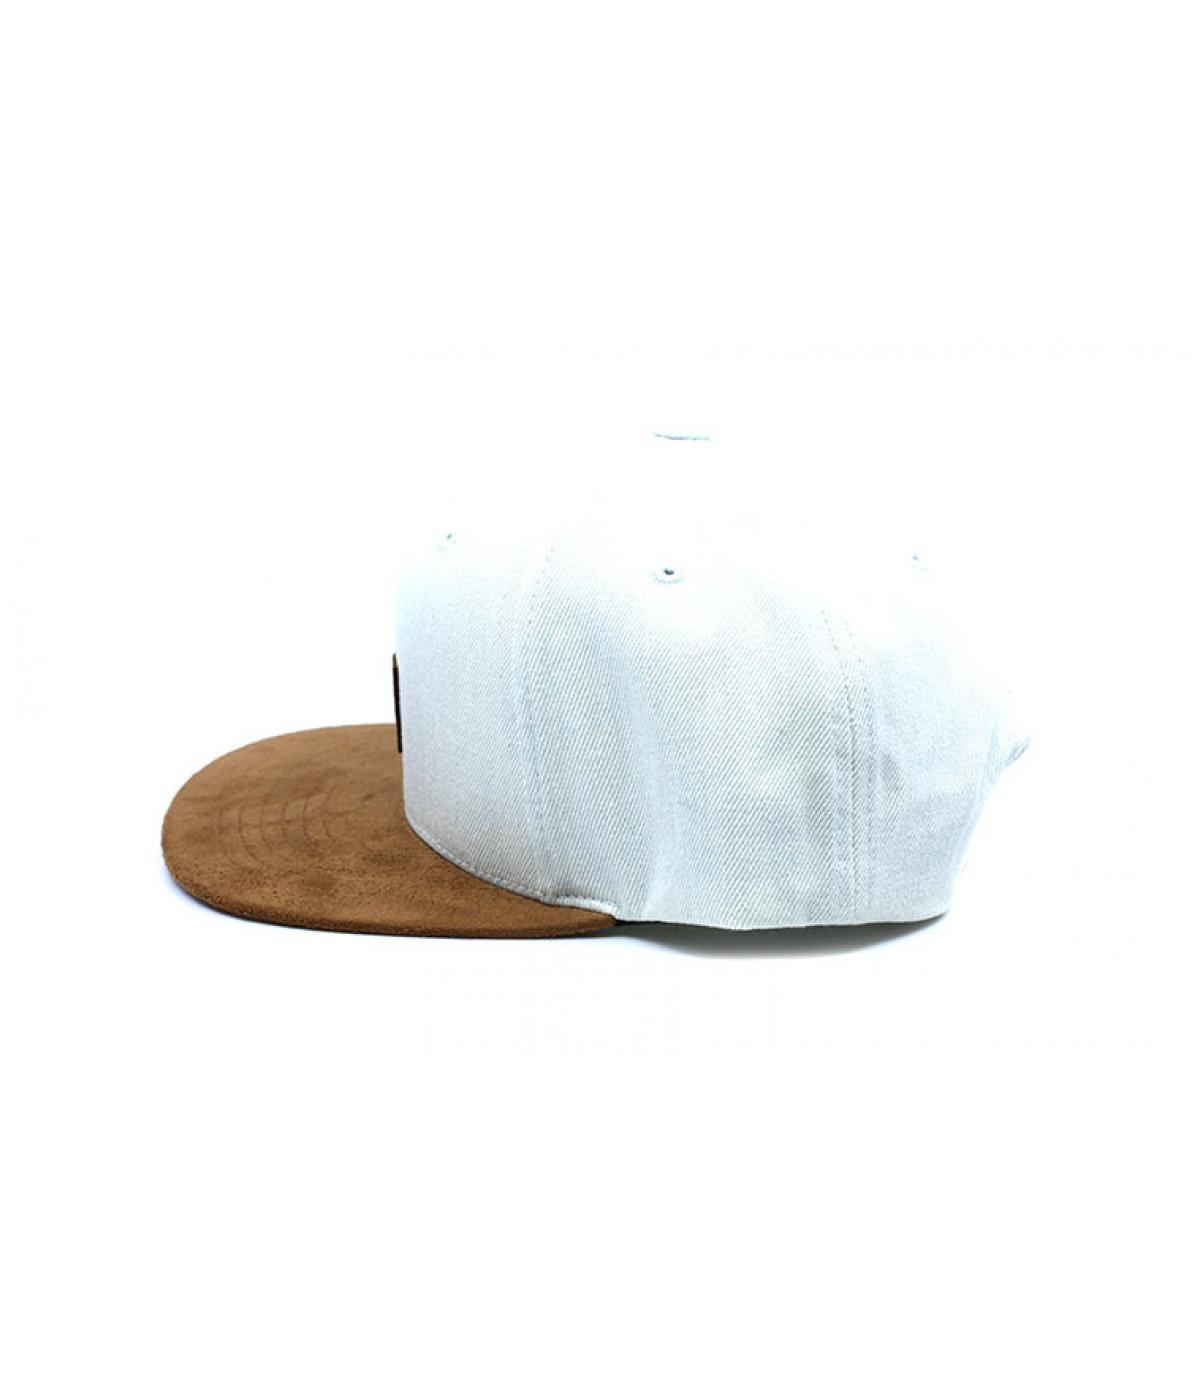 Dettagli Suede Cap bleached denim - image 4